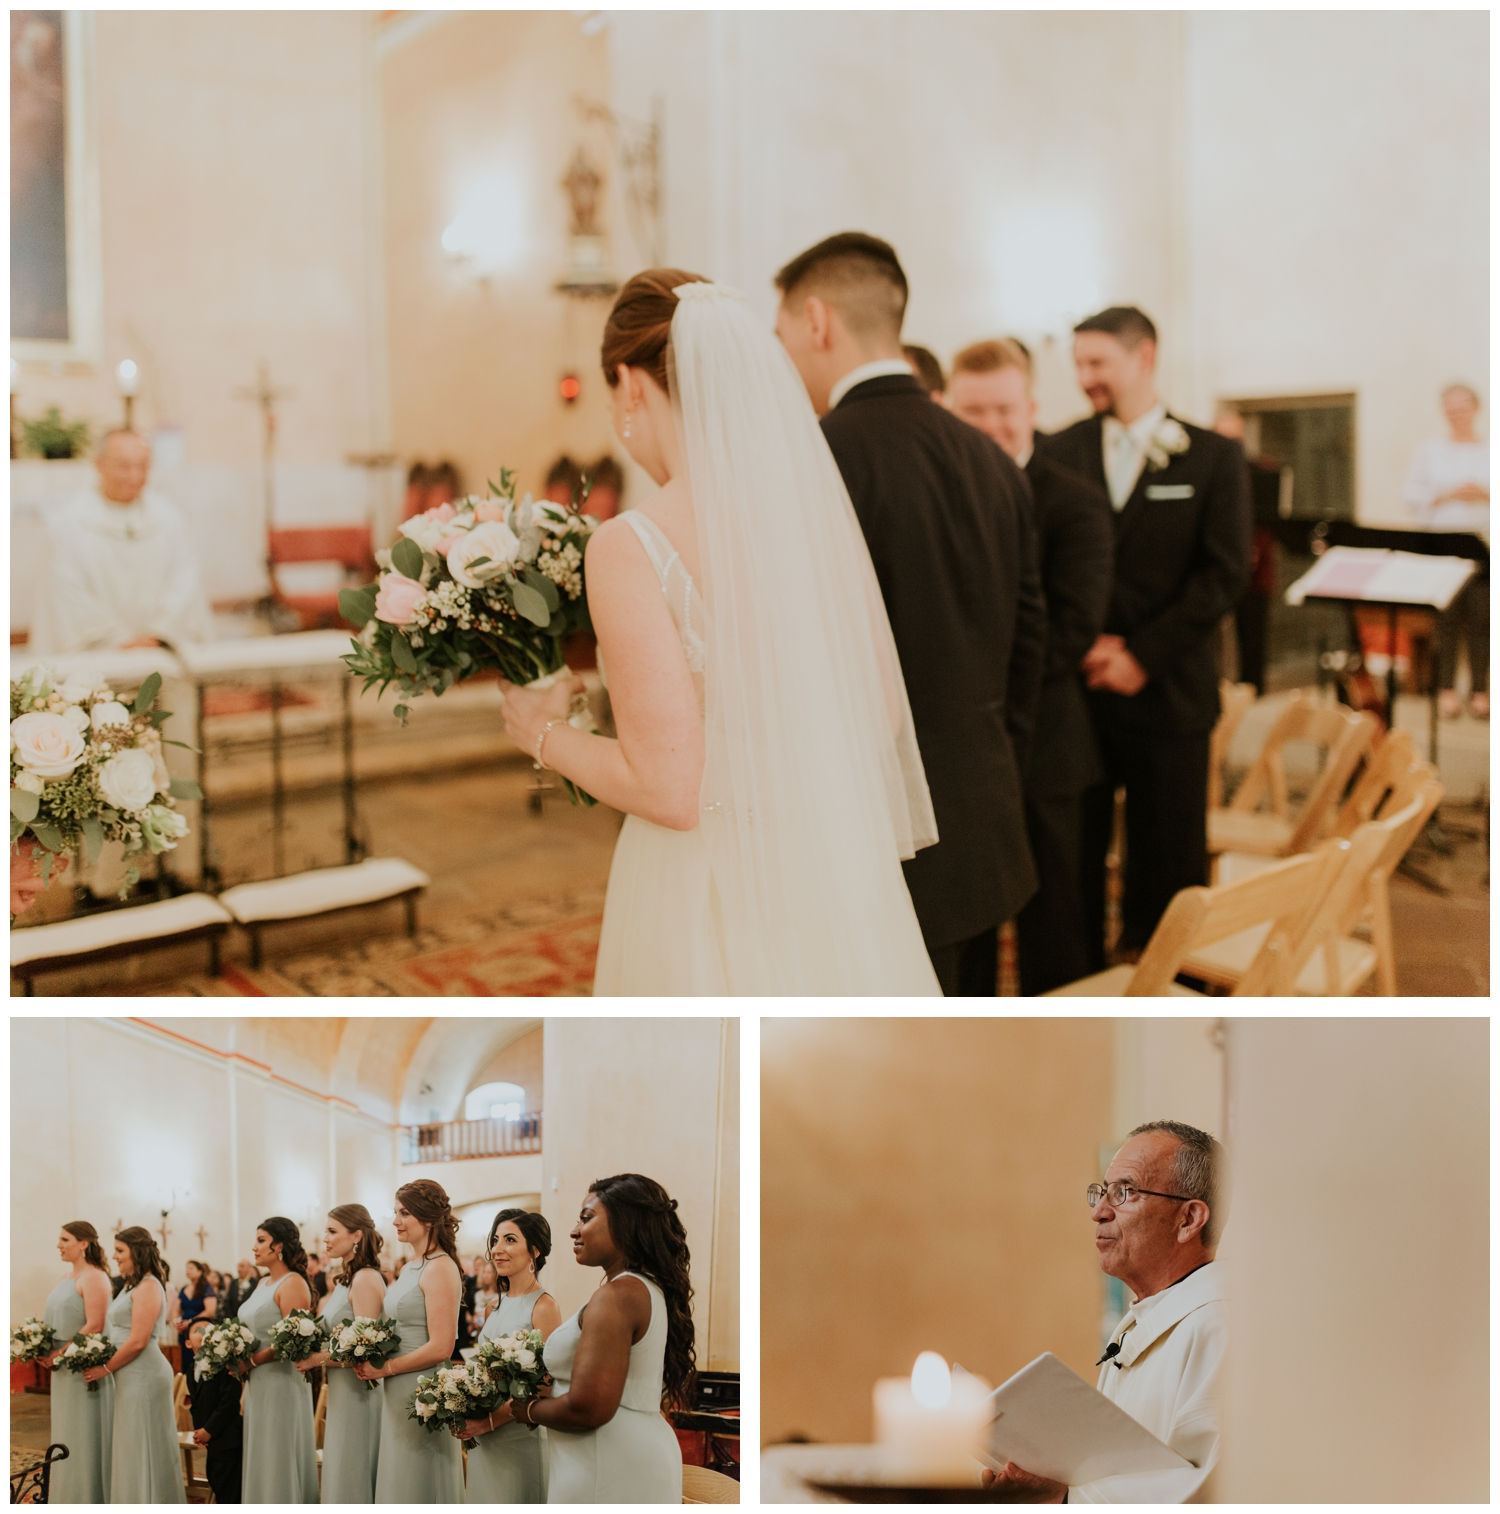 Jenna+Brandon, Mission Concepcion Wedding, San Antonio, Contista Productions Wedding Photography_0045.jpg